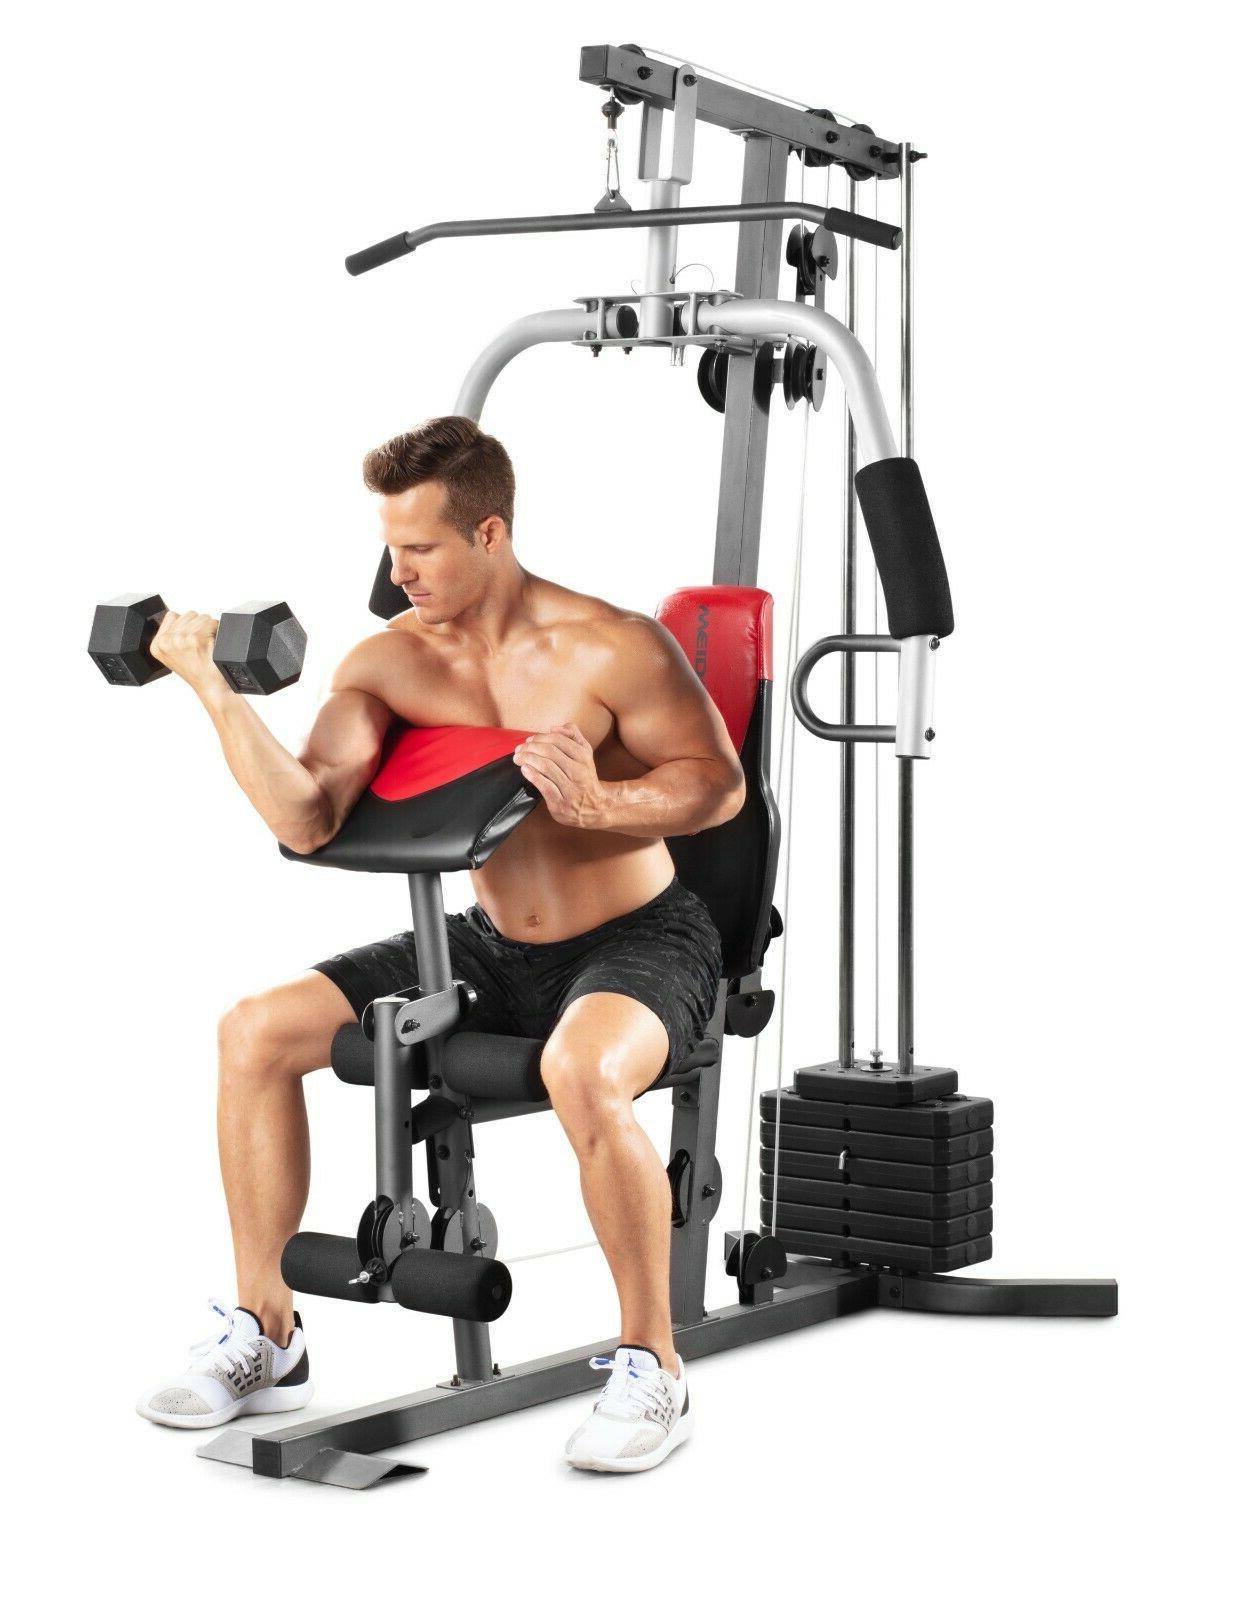 Weider 2980 Gym System Leg Developer Chest Fly Pad Workout